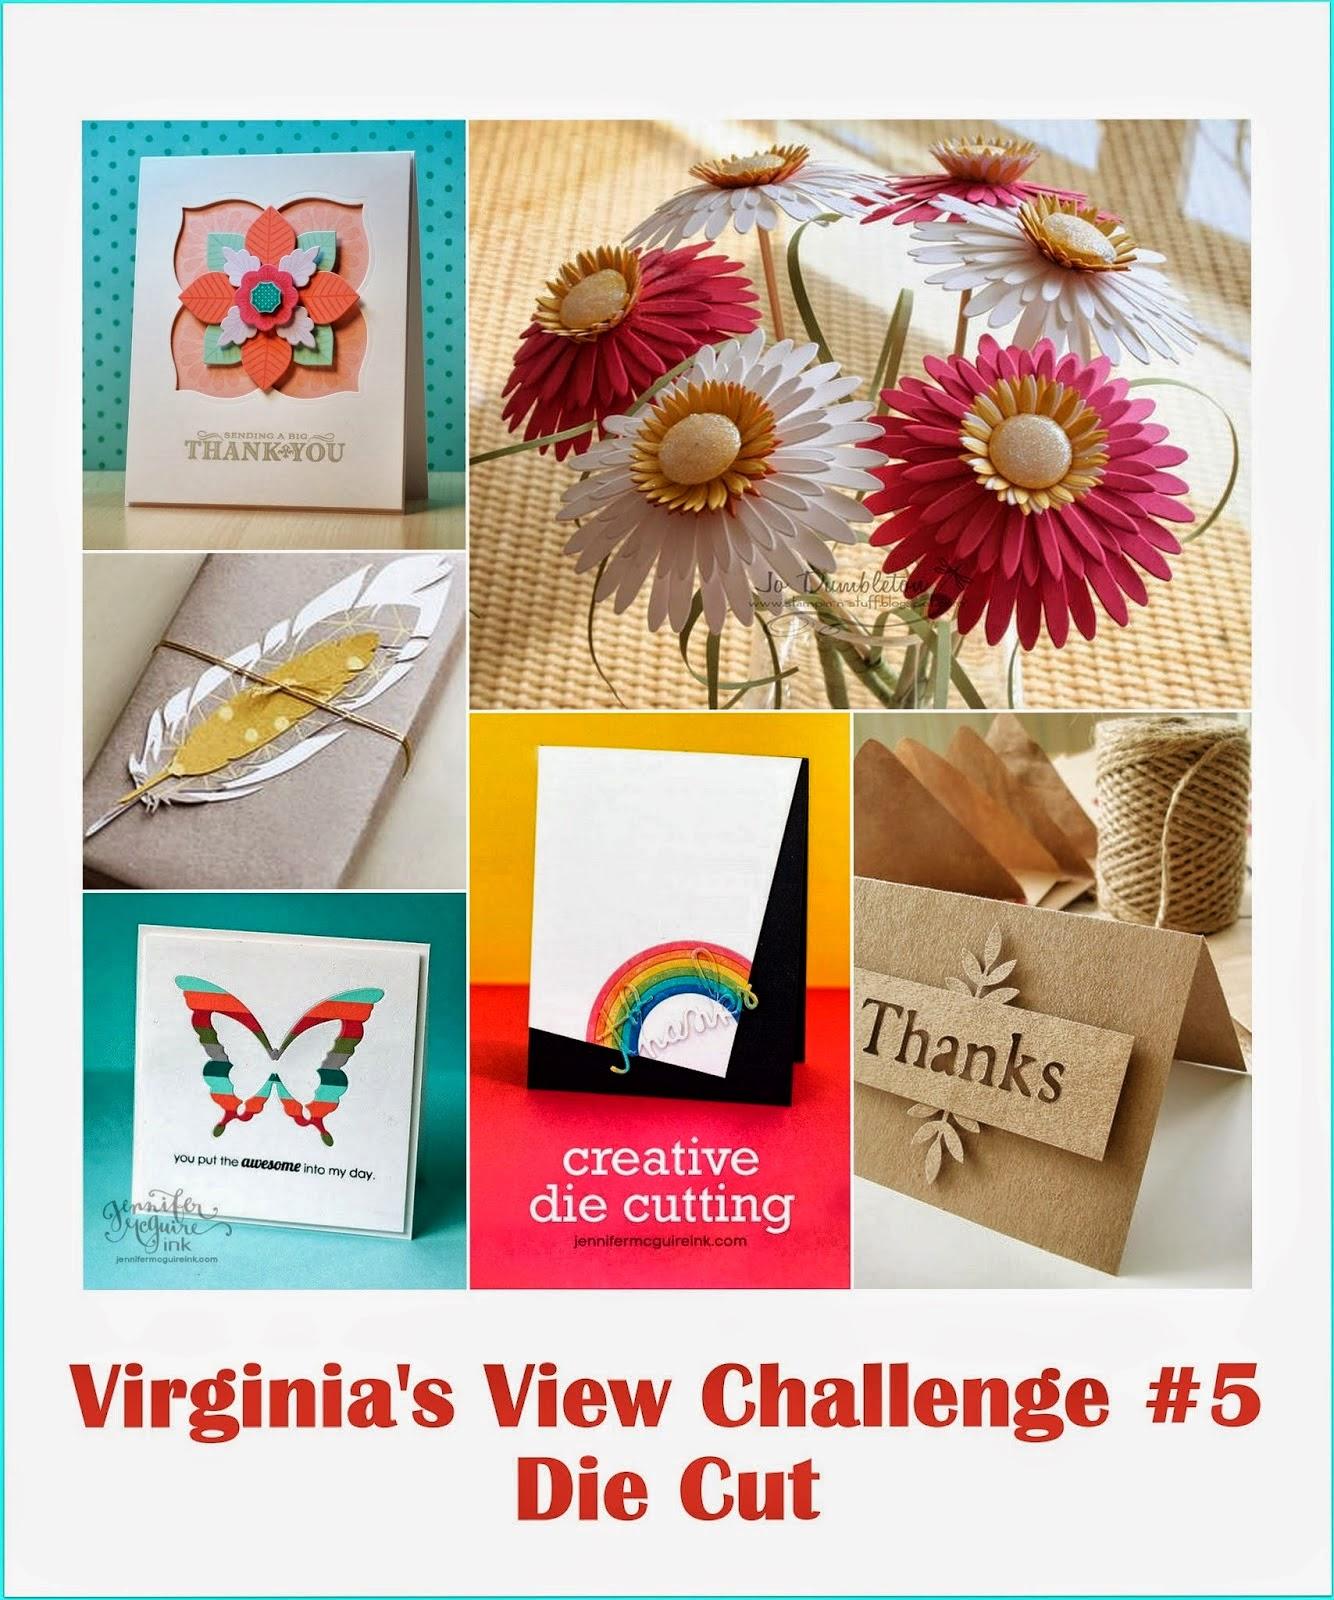 http://virginiasviewchallenge.blogspot.ca/2014/07/virginias-view-challenge-5.html